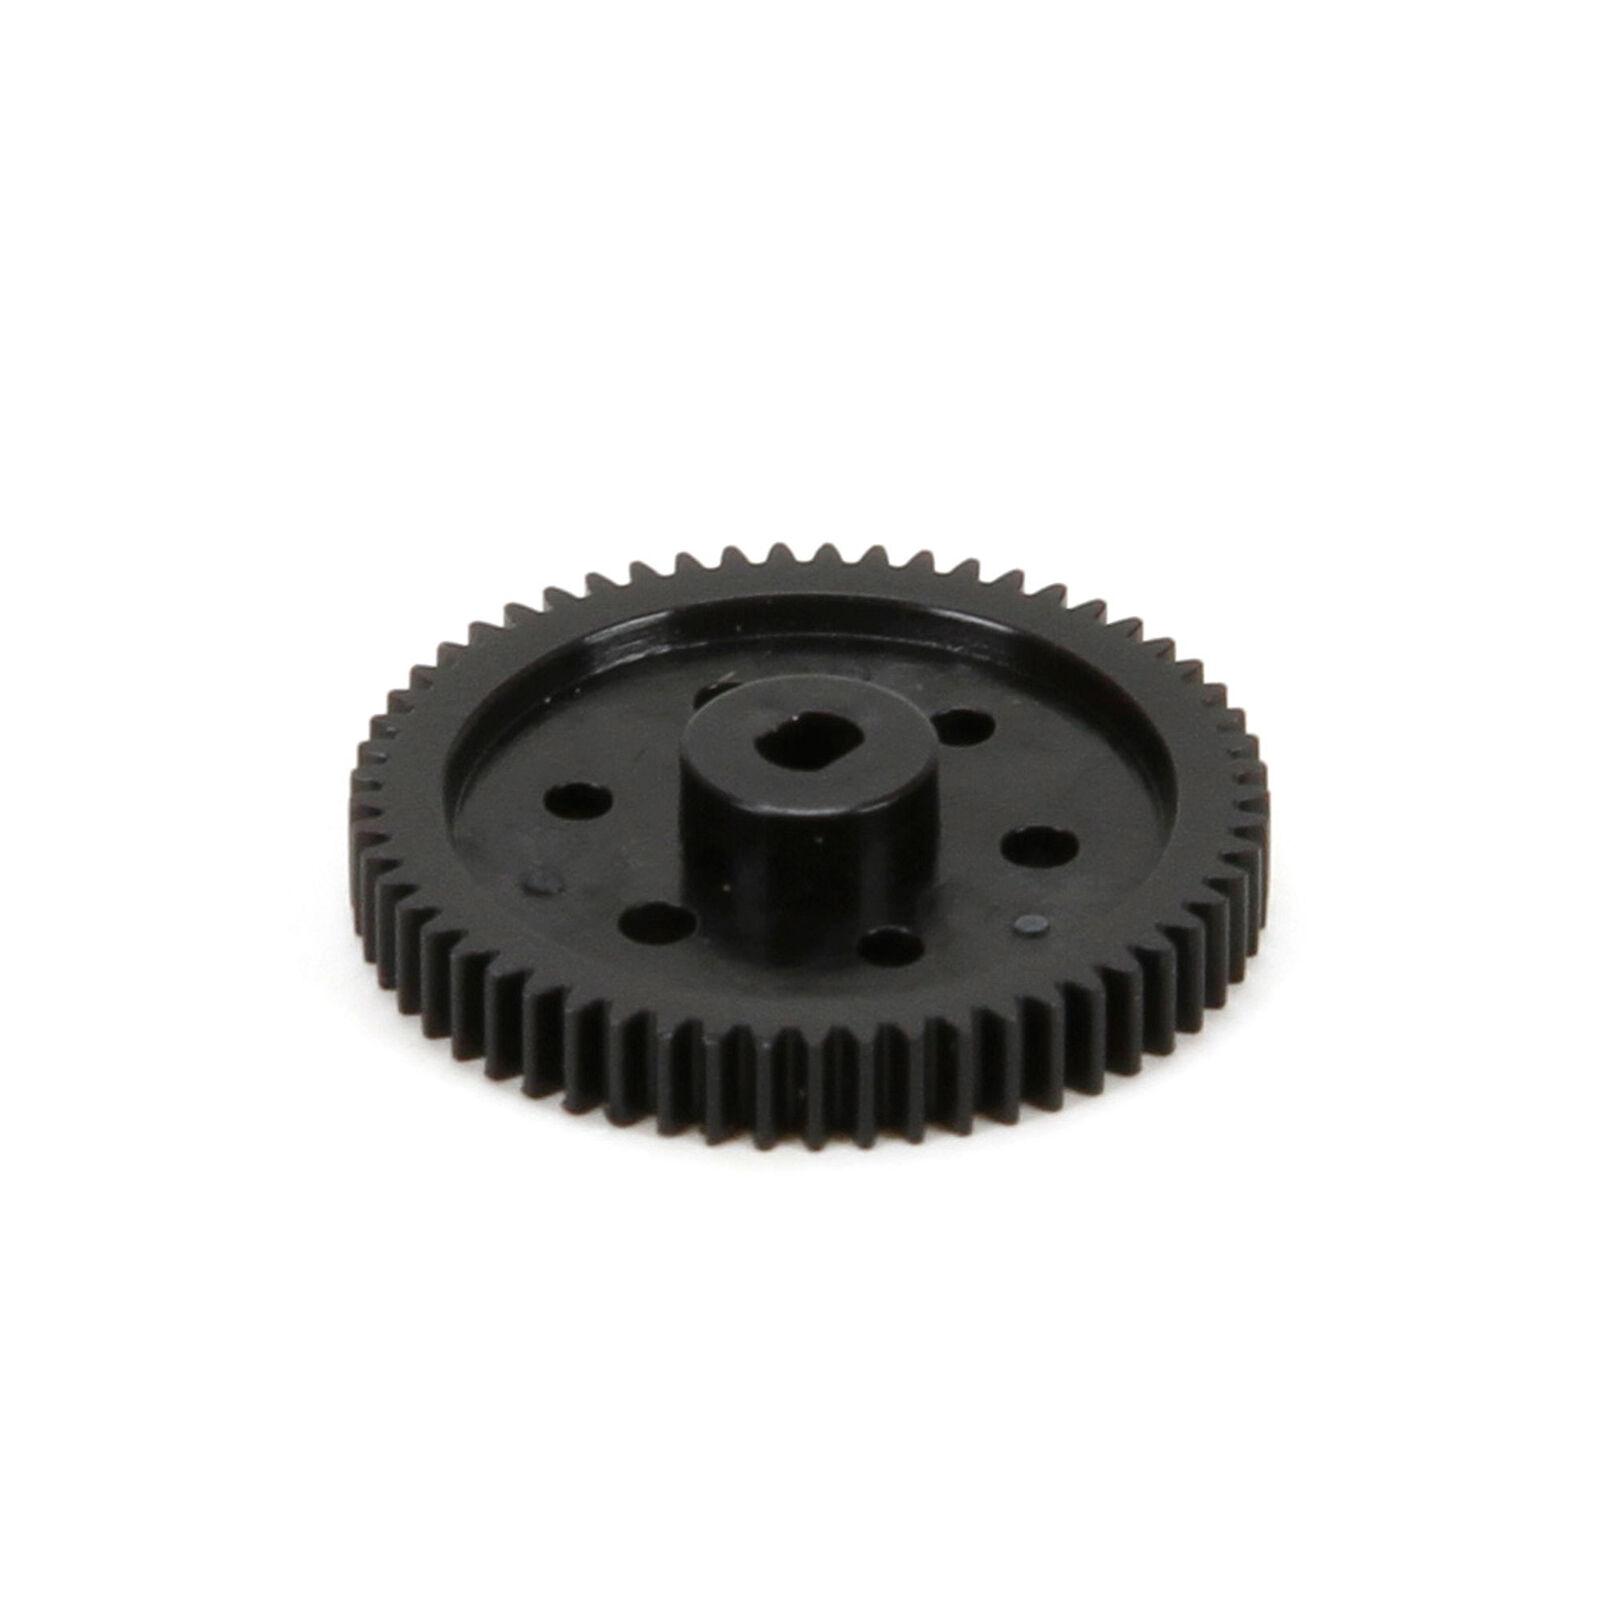 Spur Gear, 57T: 1/24 4WD Temper